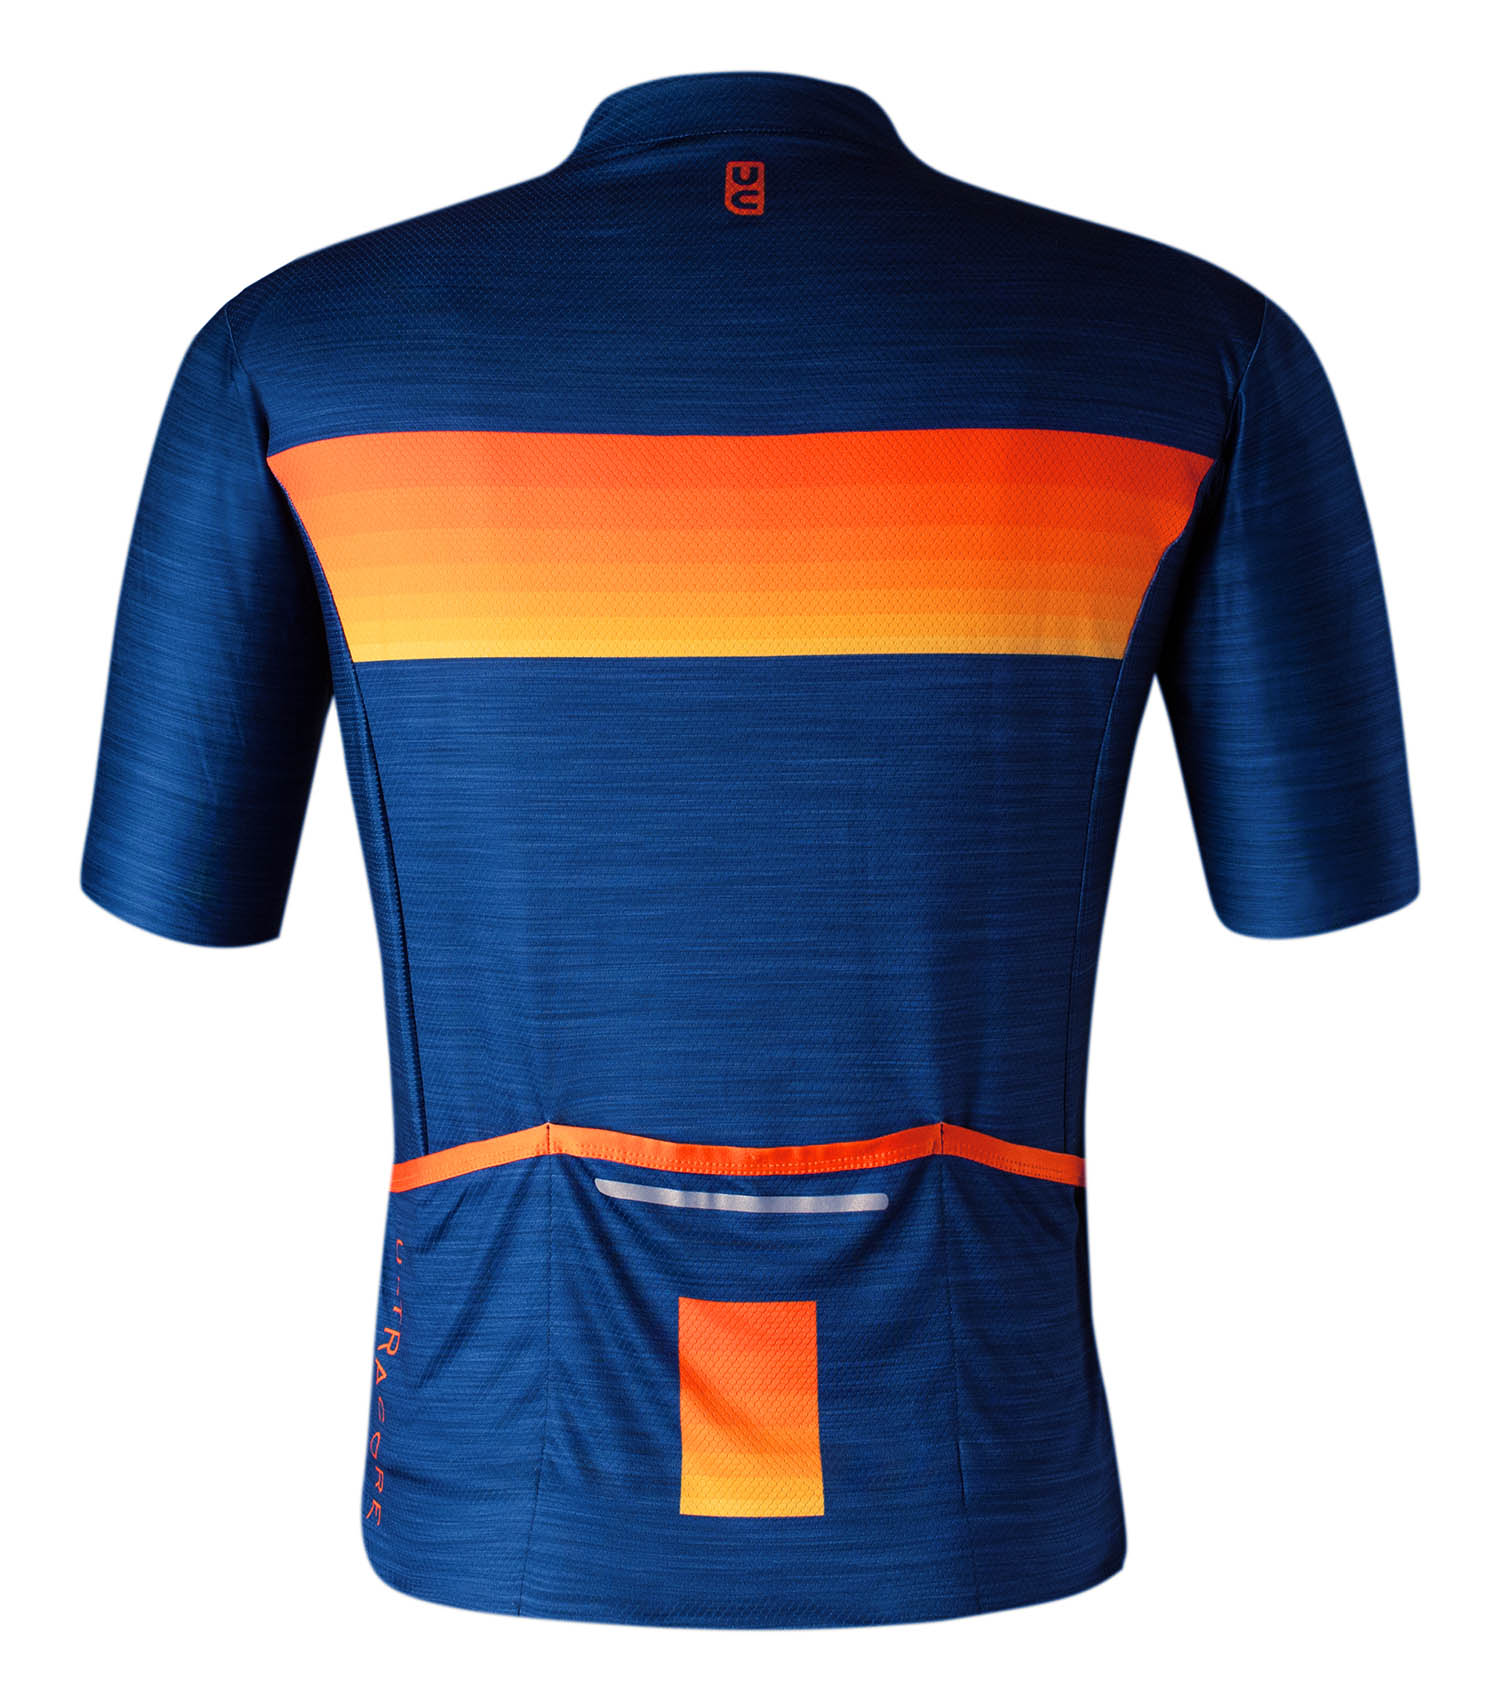 Camisa Masculina Ciclismo Autumn - Ultracore